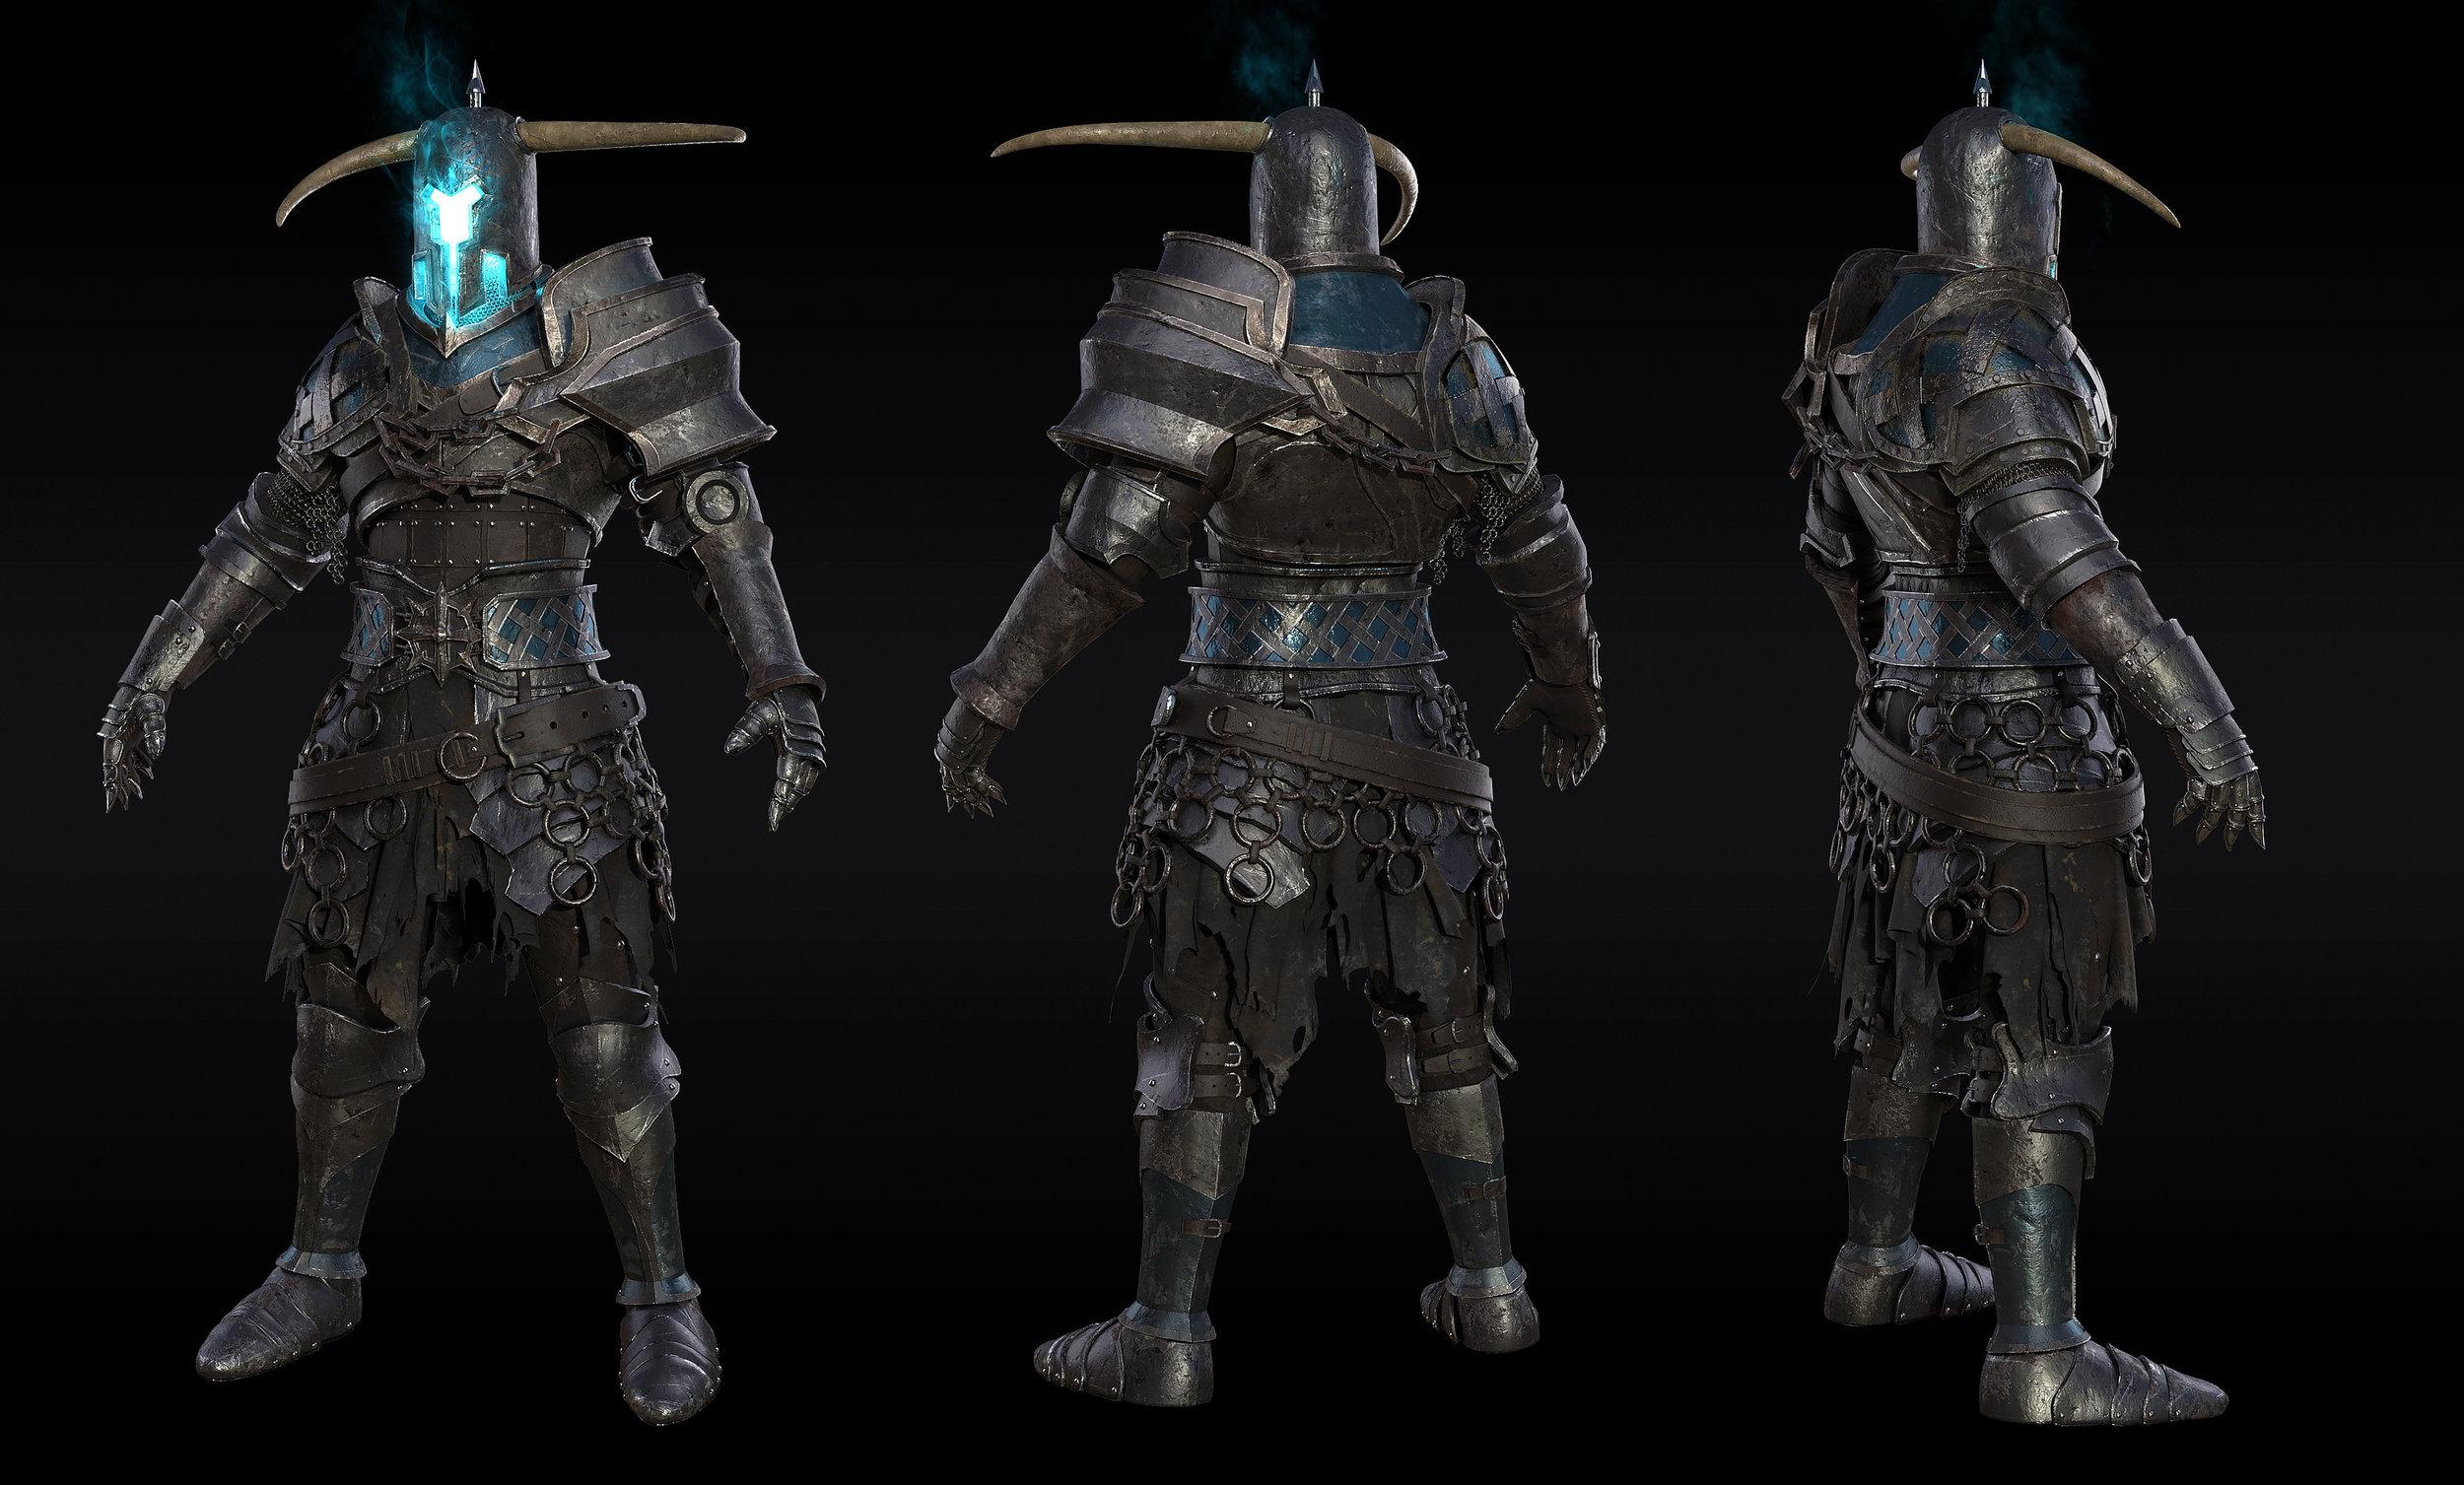 Knight_Full_Textured_Modelsheet_Jorge_Barrero.jpg